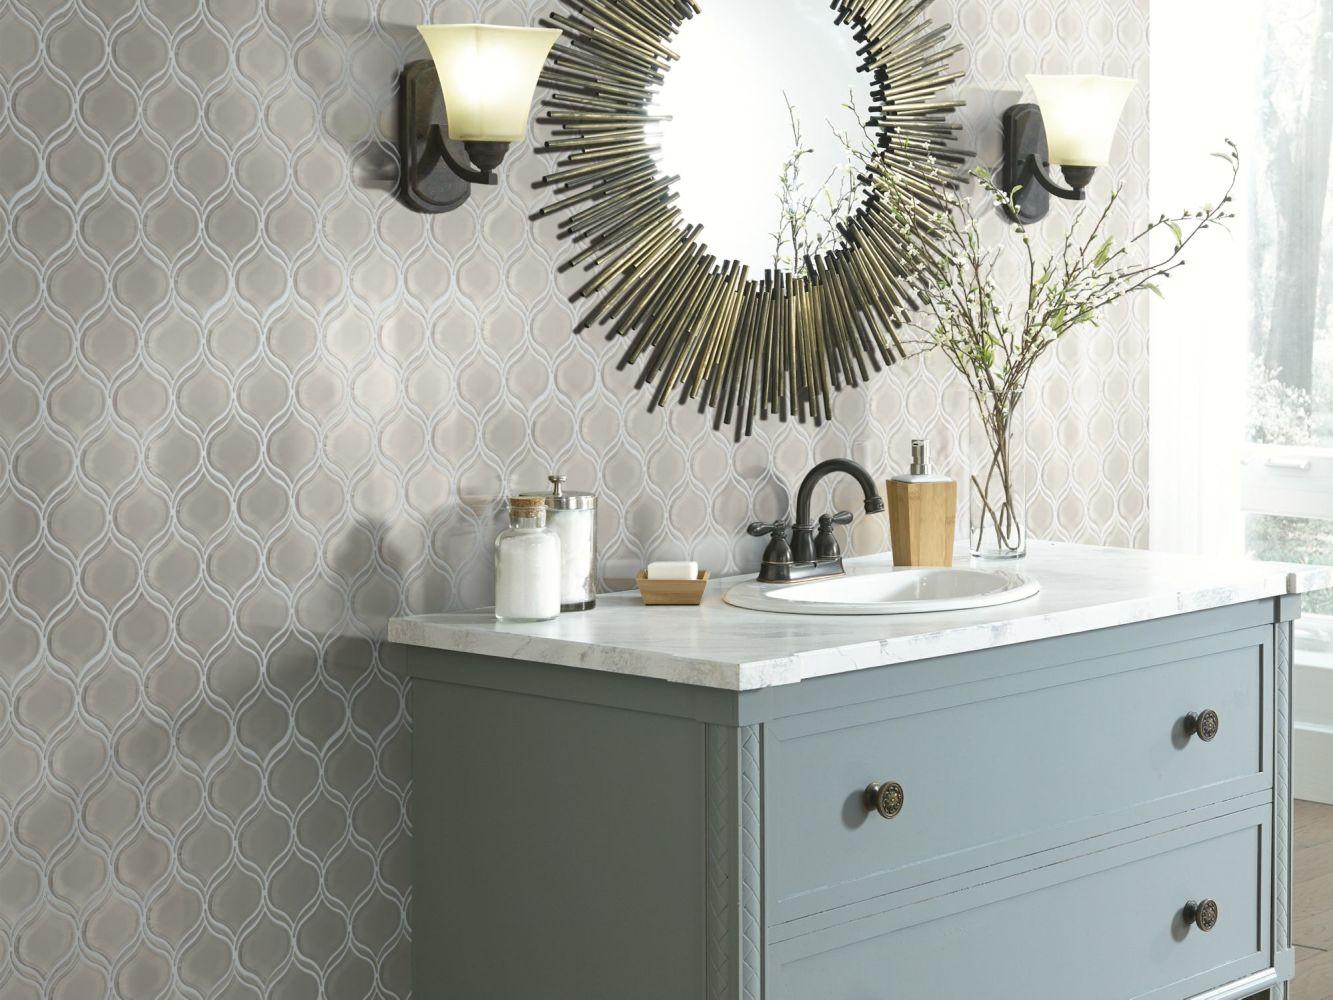 Shaw Floors SFA Paramount Lantern Glass Mosaic Mist 00250_SA18A